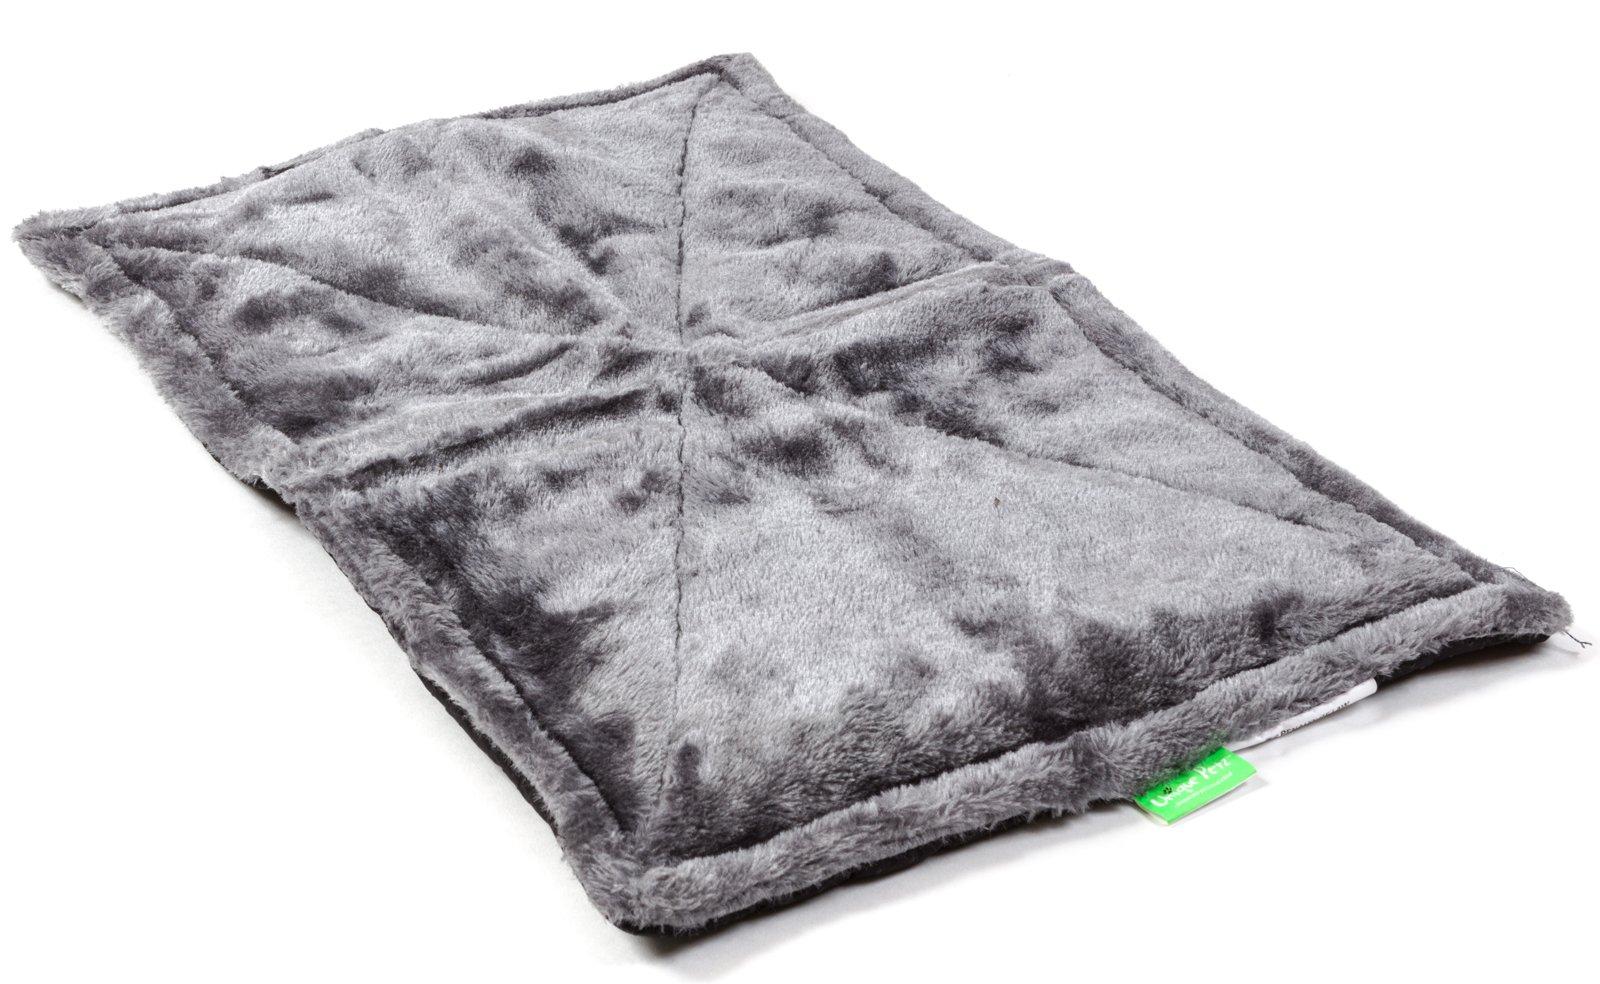 Unique Petz Self-Warming Comfort Pet Mat - Smoke